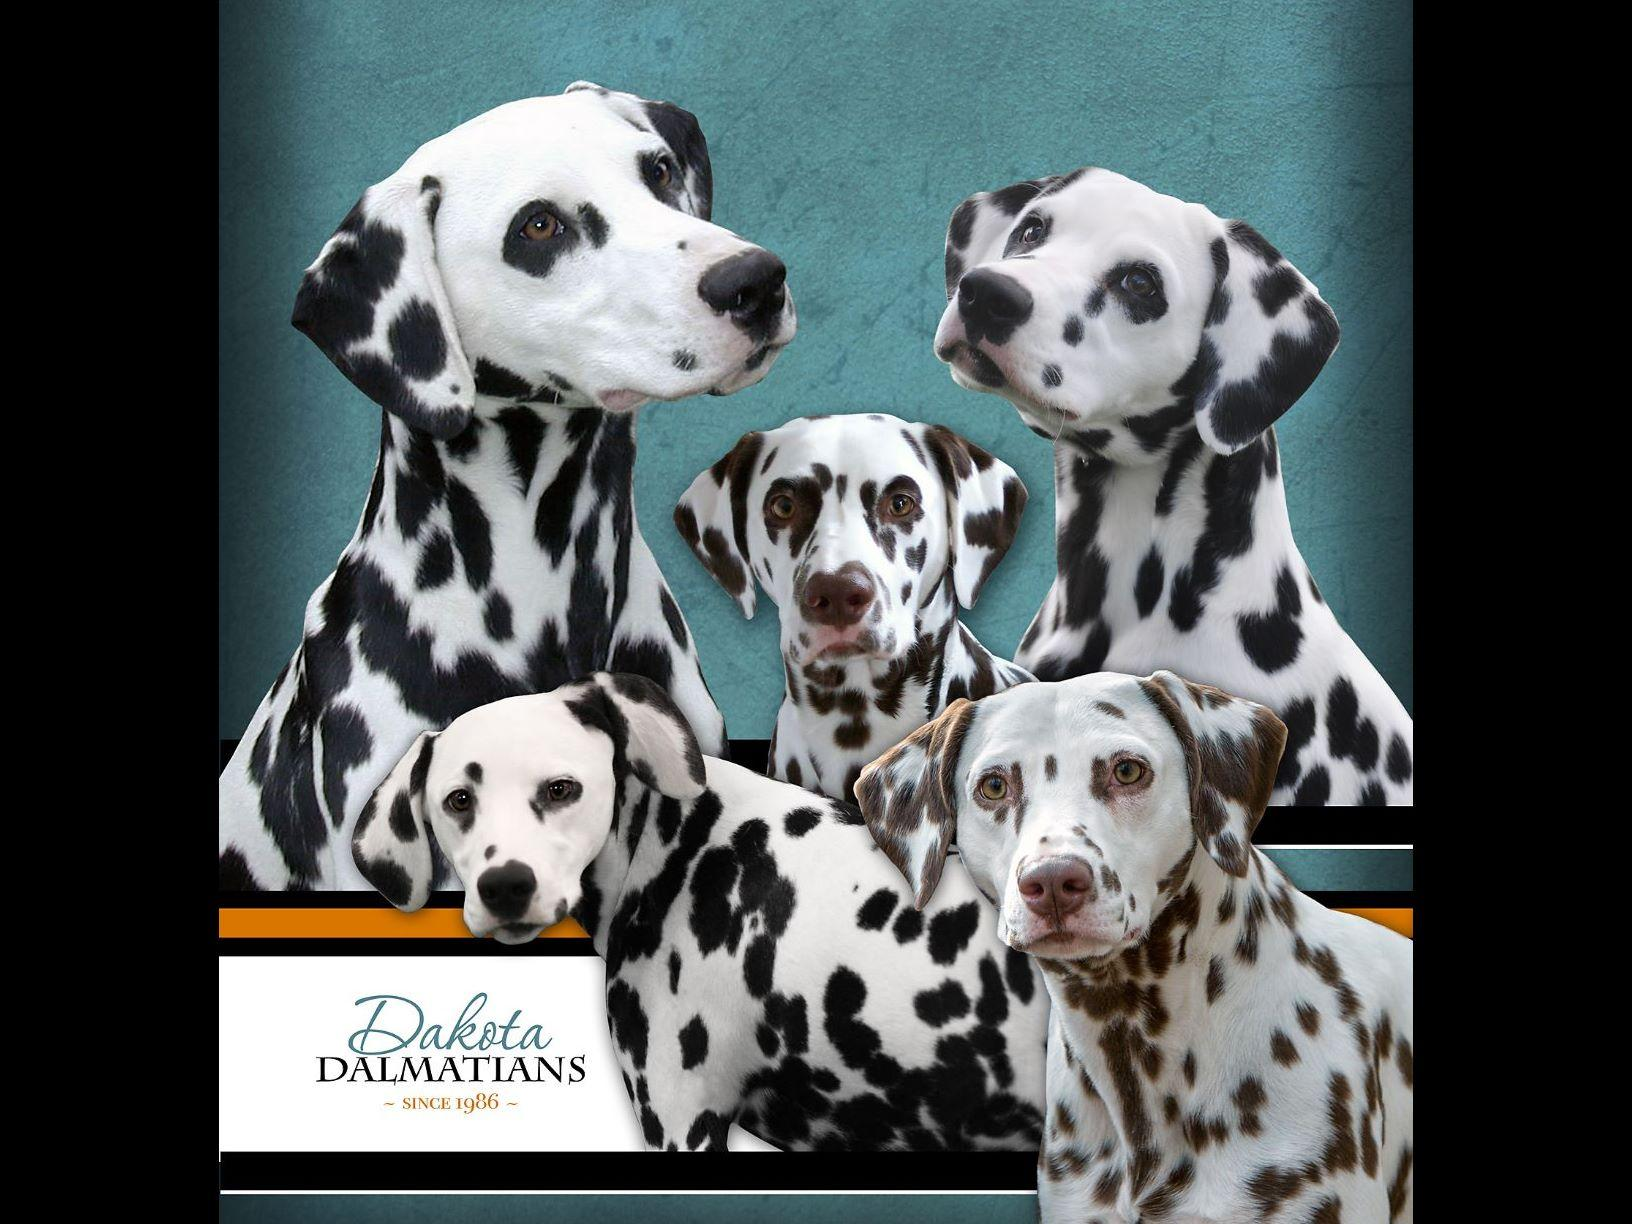 dakota dalmatians puppies for sale. Black Bedroom Furniture Sets. Home Design Ideas